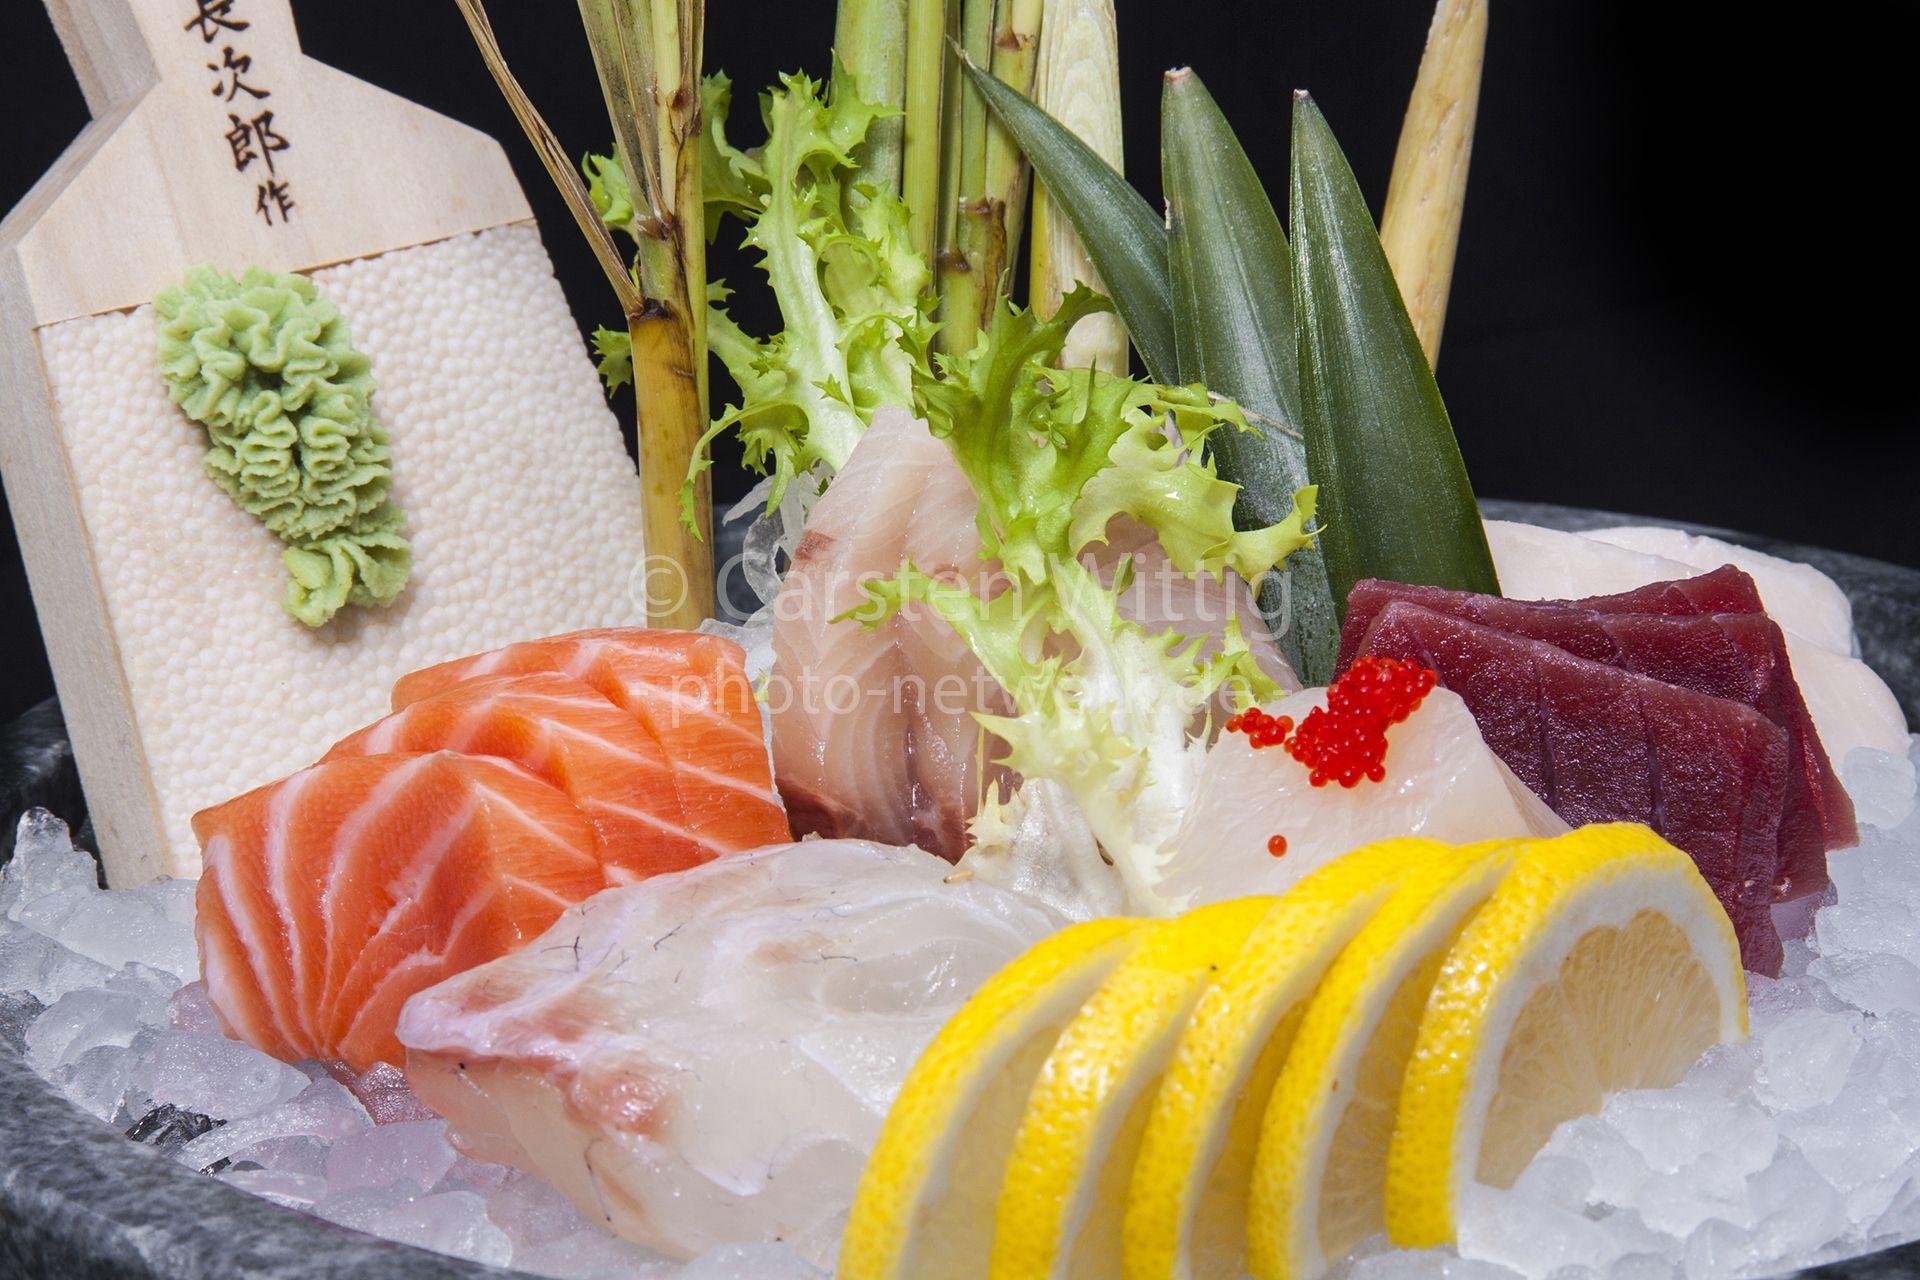 Sushi - Shiki I